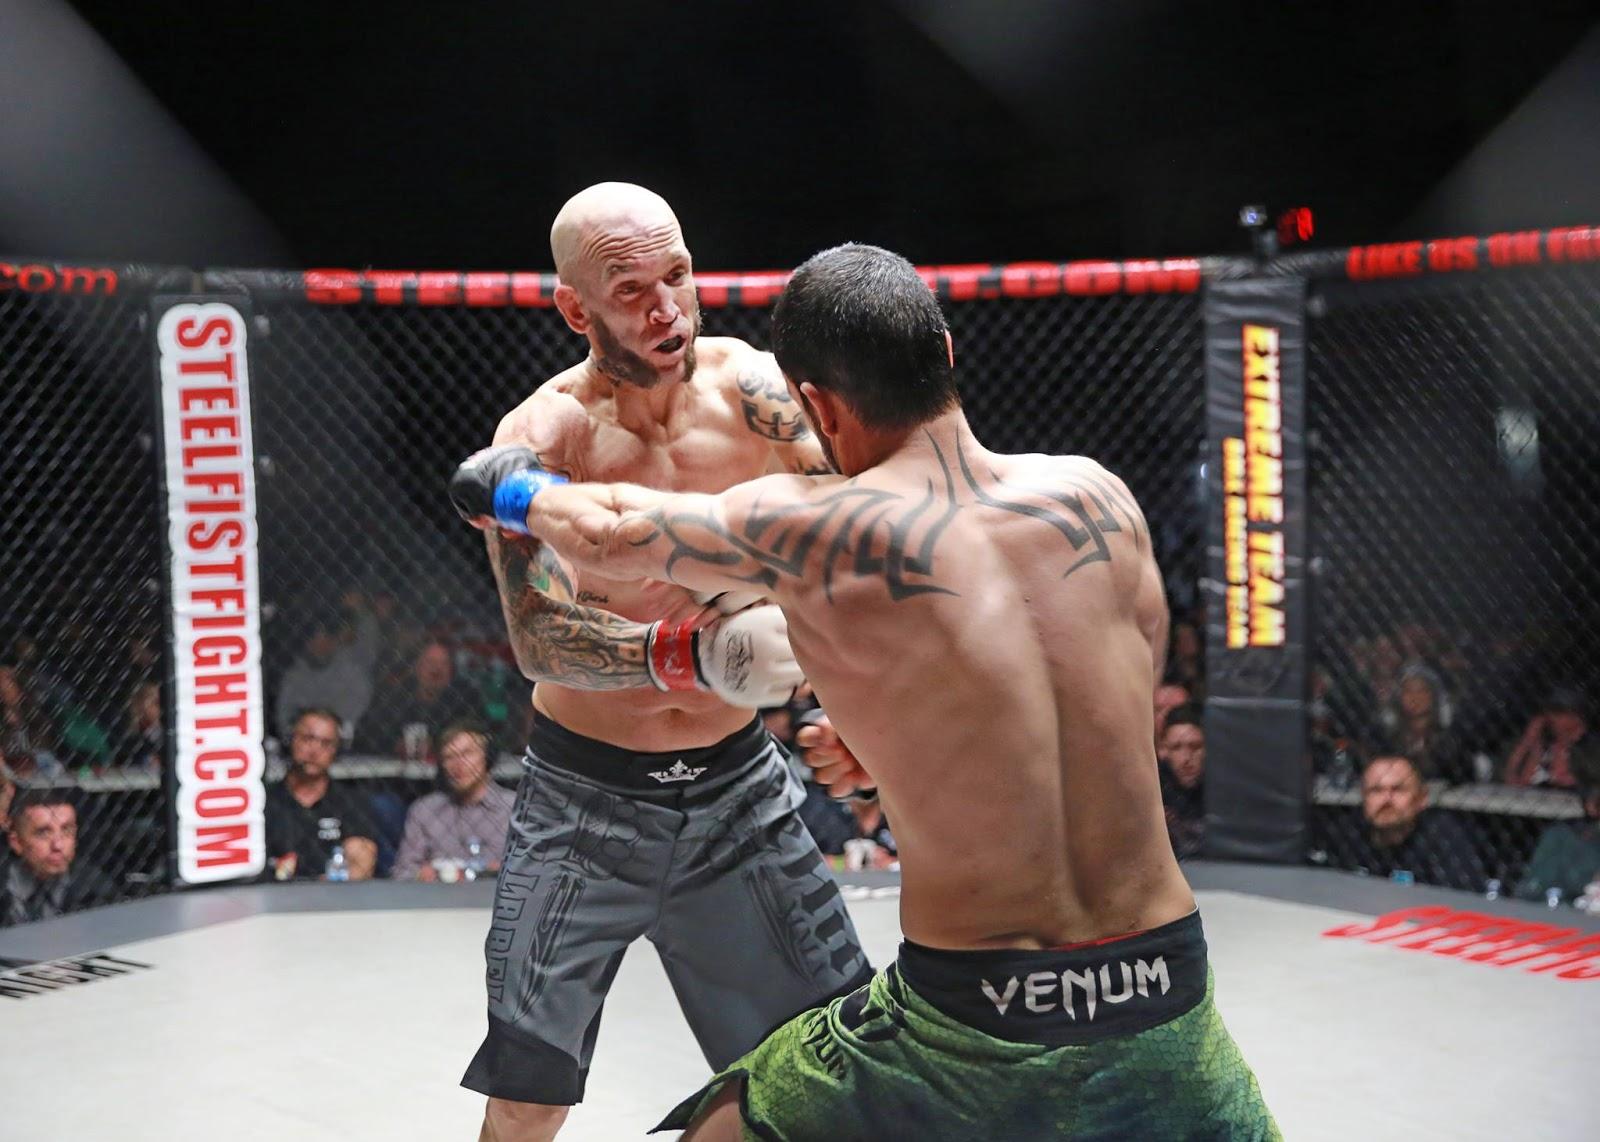 Plus ça Fighting style gentile fist